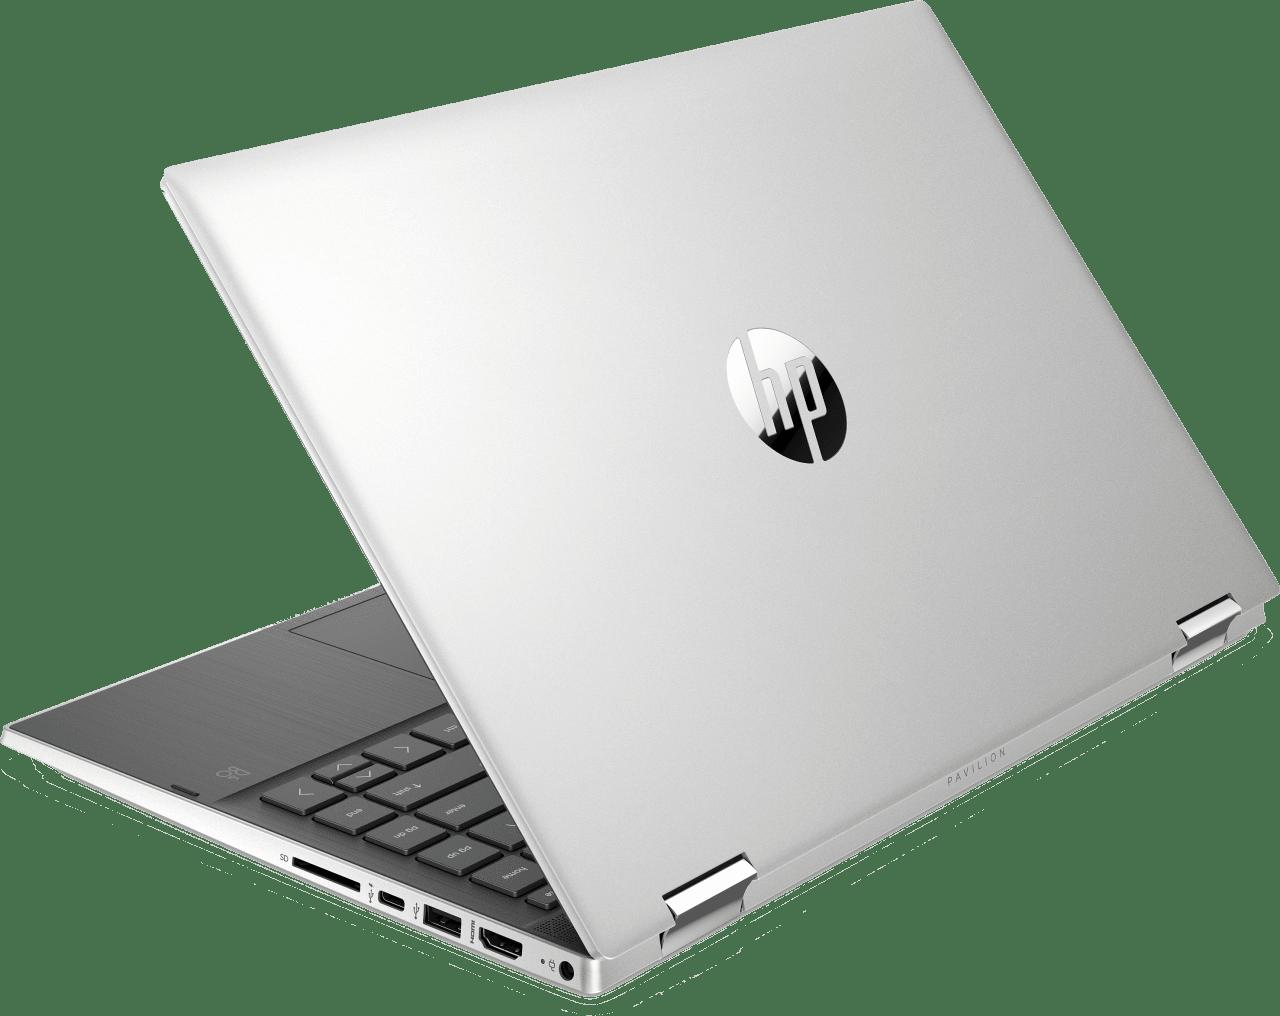 Natural Silver HP Pavilion x360 14-dw0230ng 2in1 - Intel® Core™ i3-1005G1 - 8GB - 256GB PCIe - Intel® UHD Graphics.4